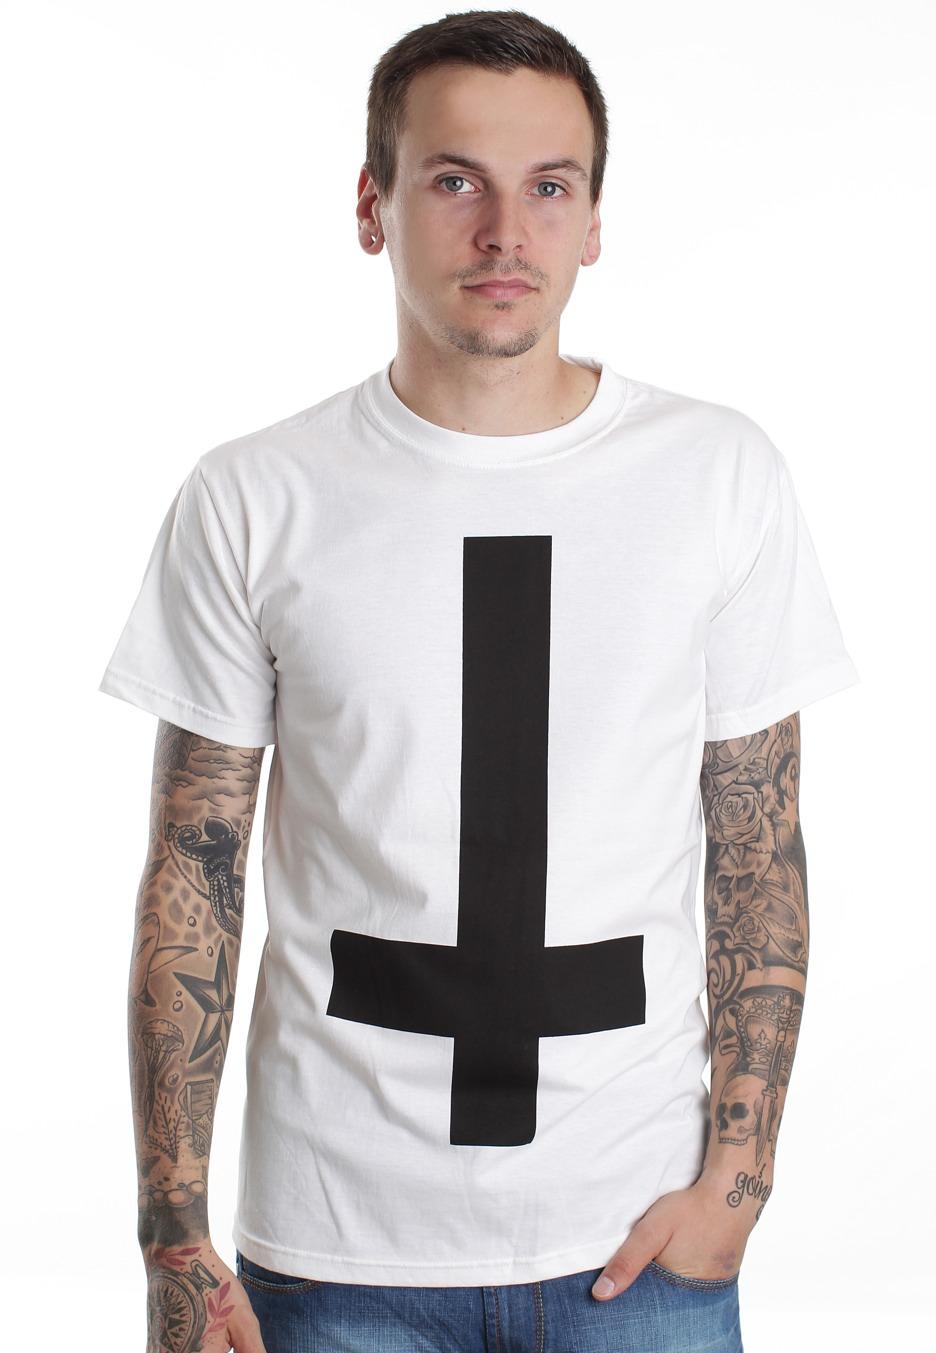 Black t shirt white cross - Abandon Ship Apparel Cross White T Shirt Streetwear Shop Impericon Com Worldwide